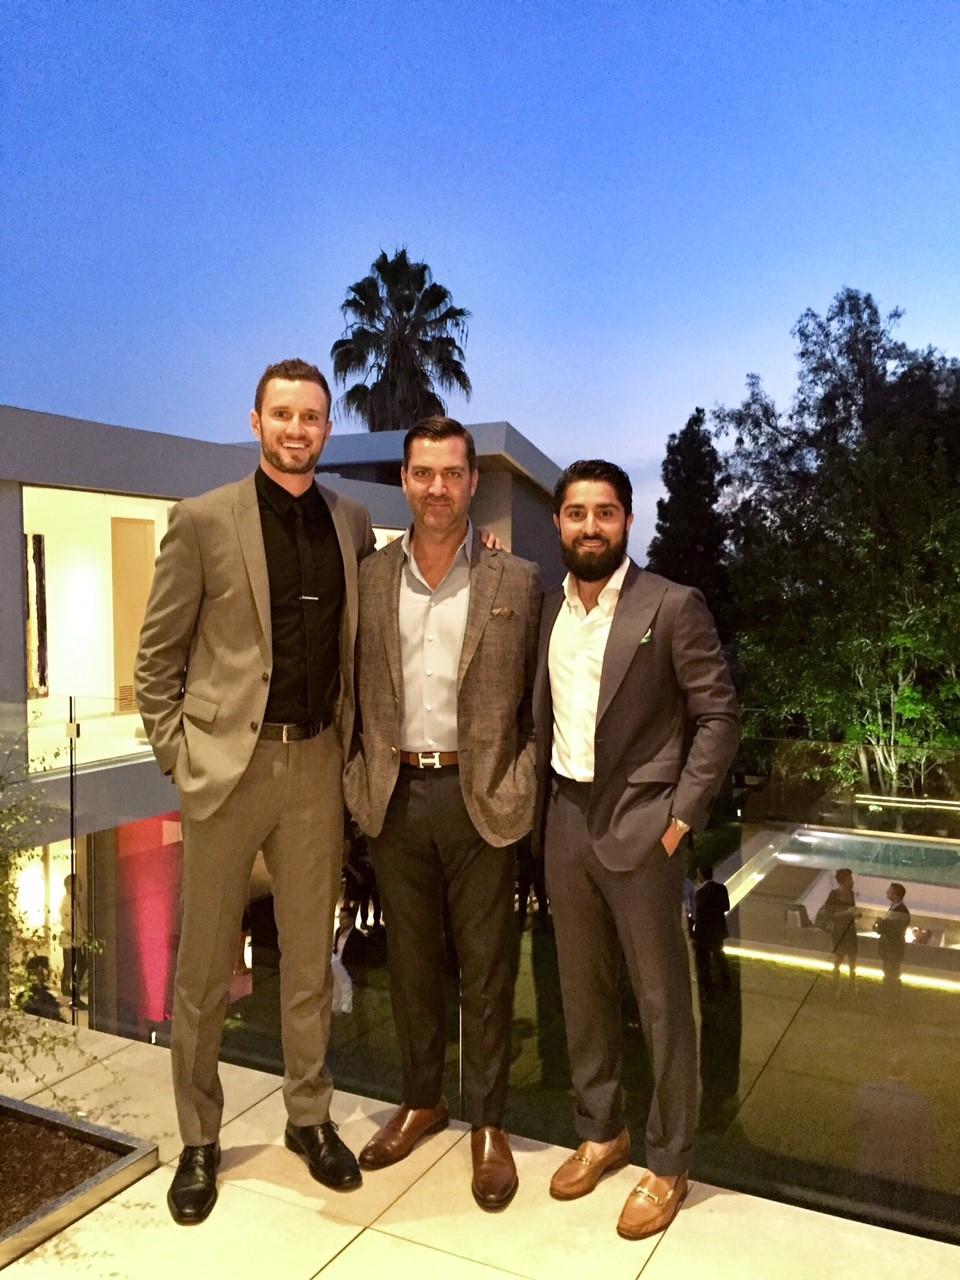 Scott Wasner, Dusty Baker (me) and Roh Habibi.